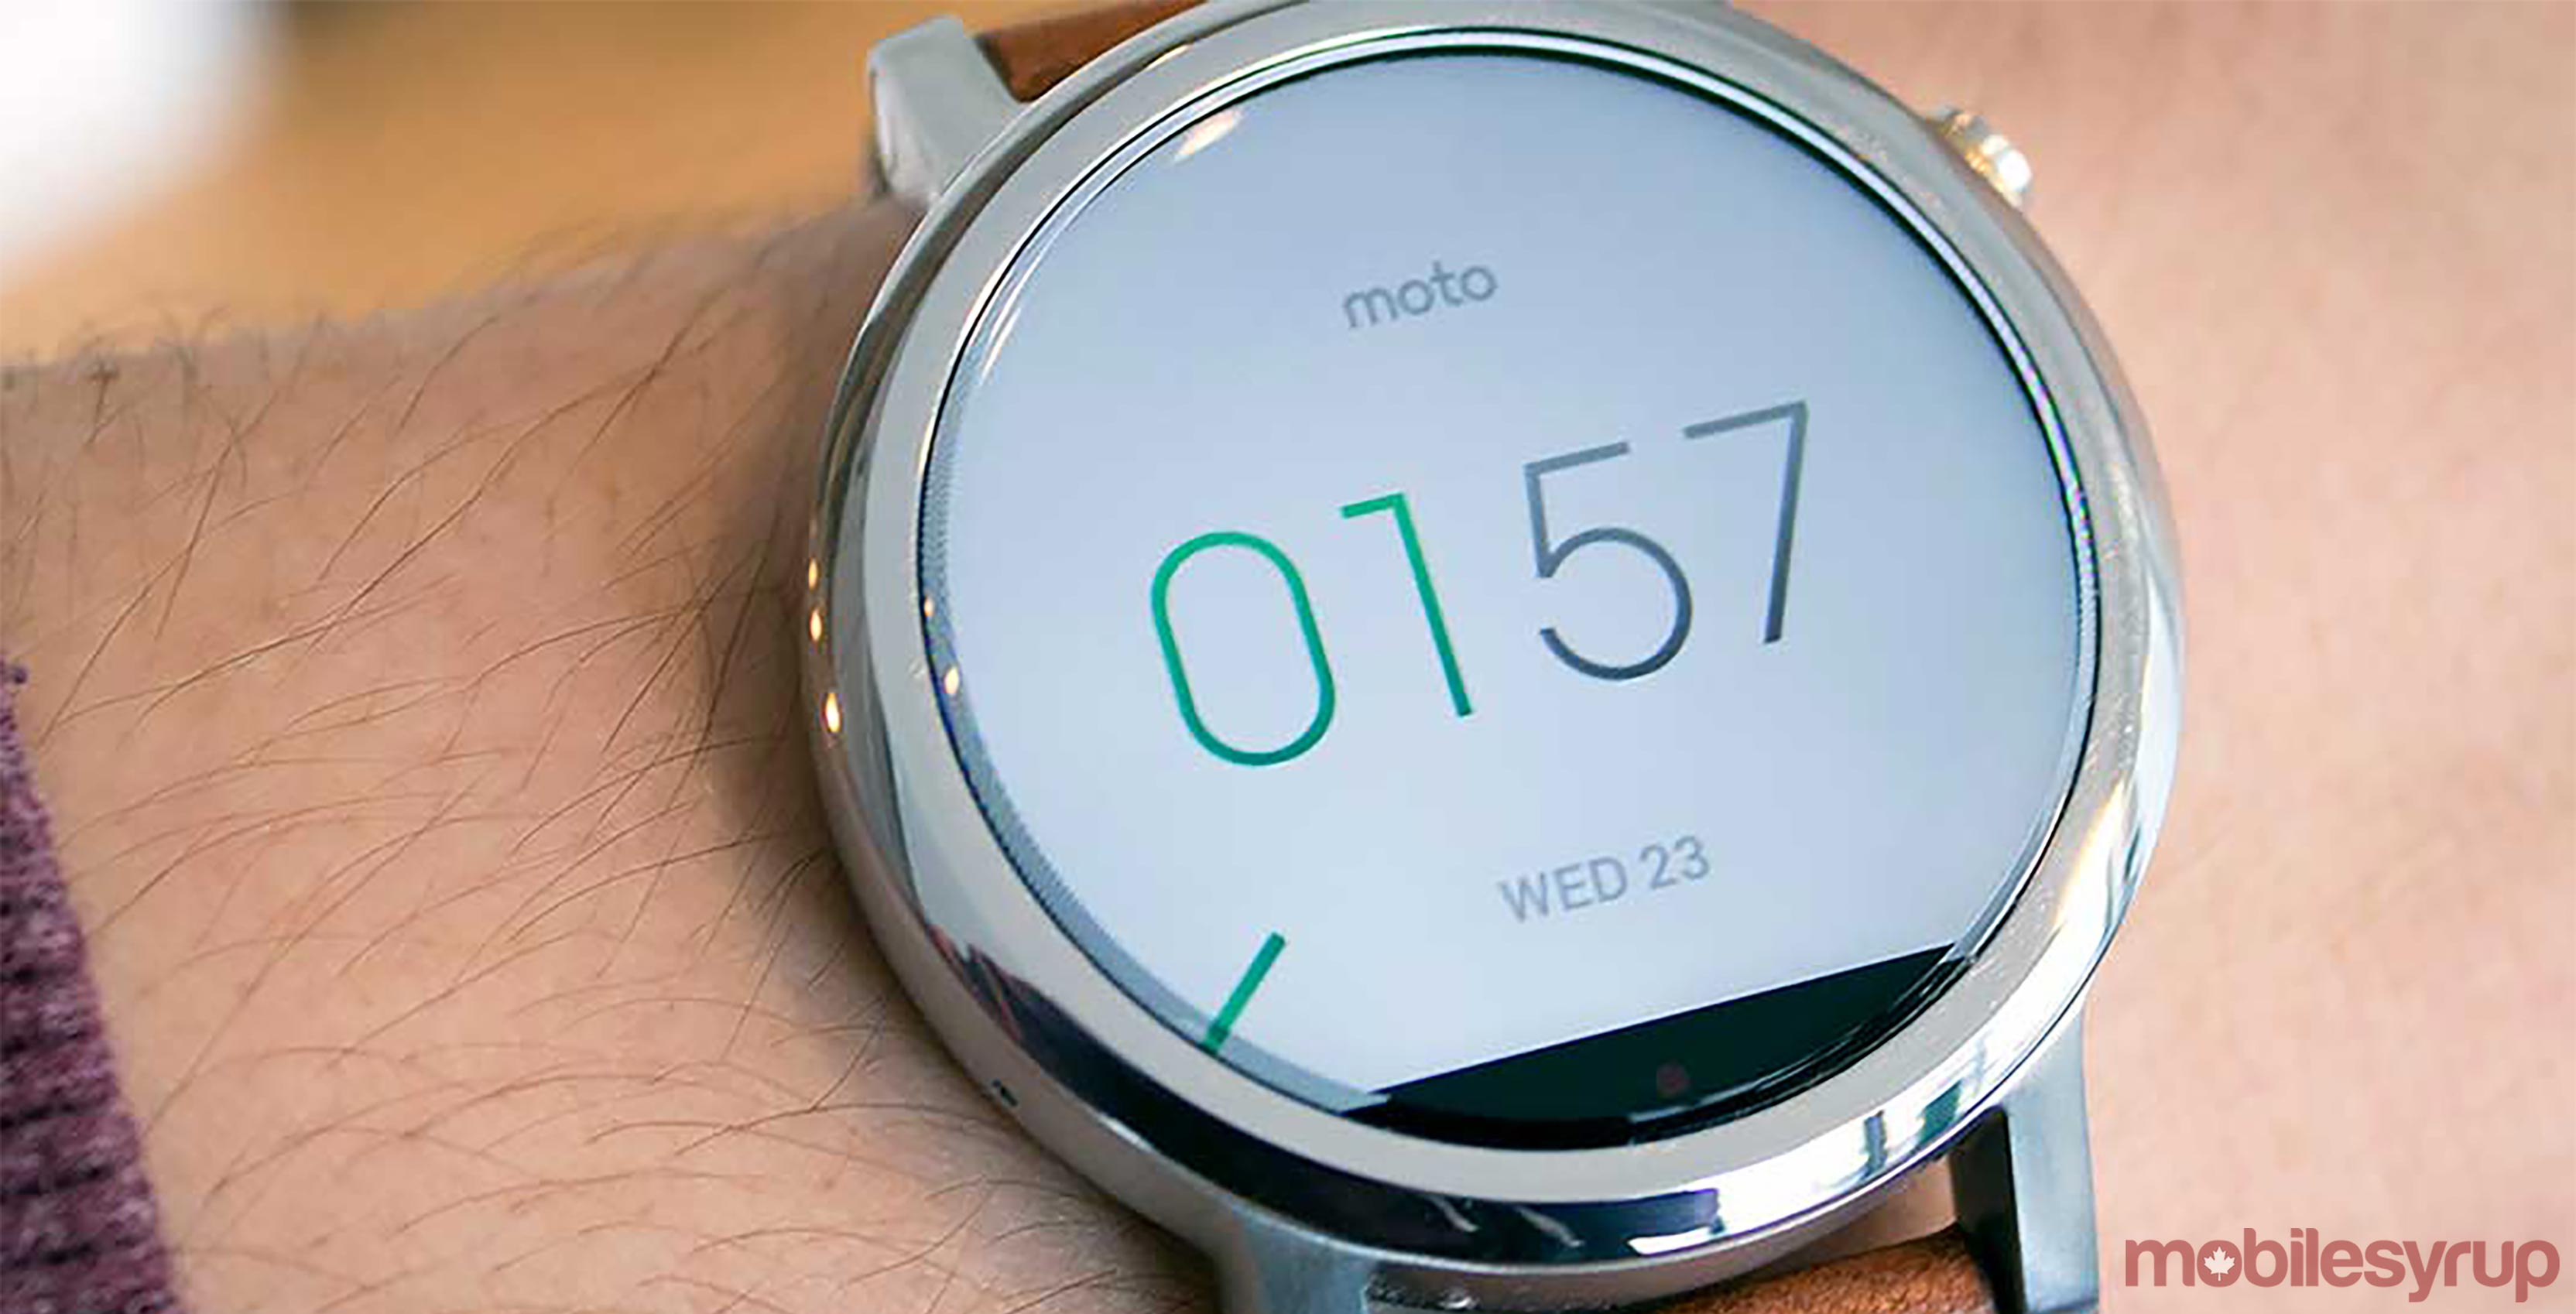 Moto 360 second generation smartwatch